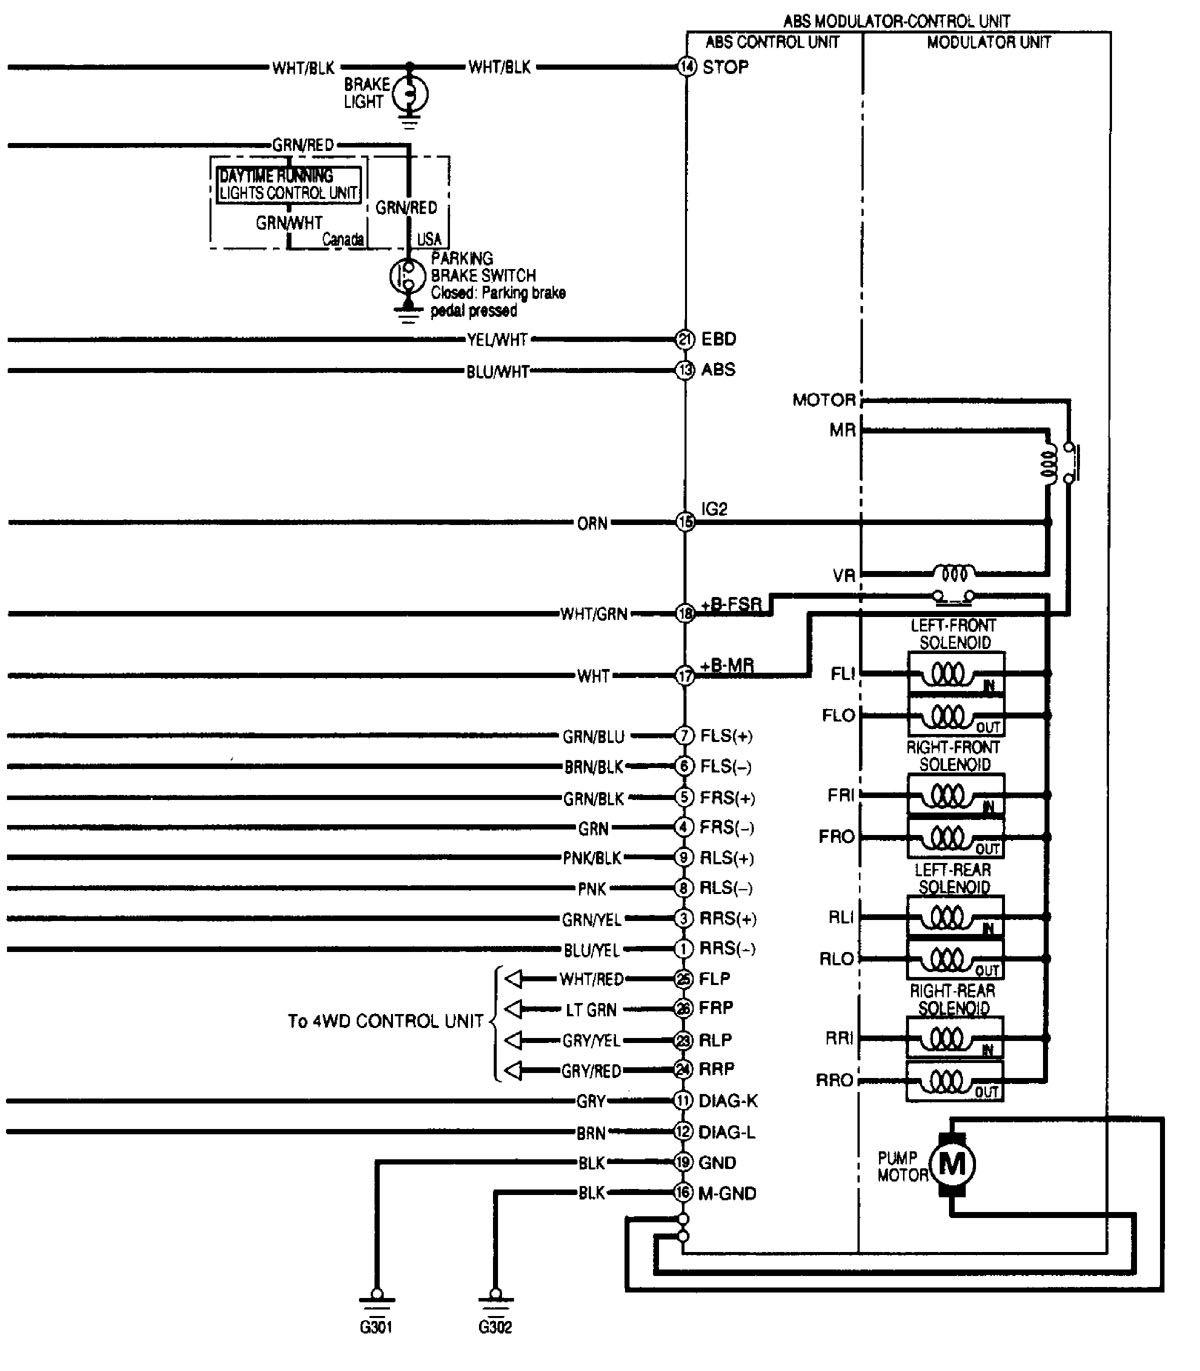 diagram 2009 acura mdx ac diagram wiring schematicacura mdx (2001) wiring  diagrams